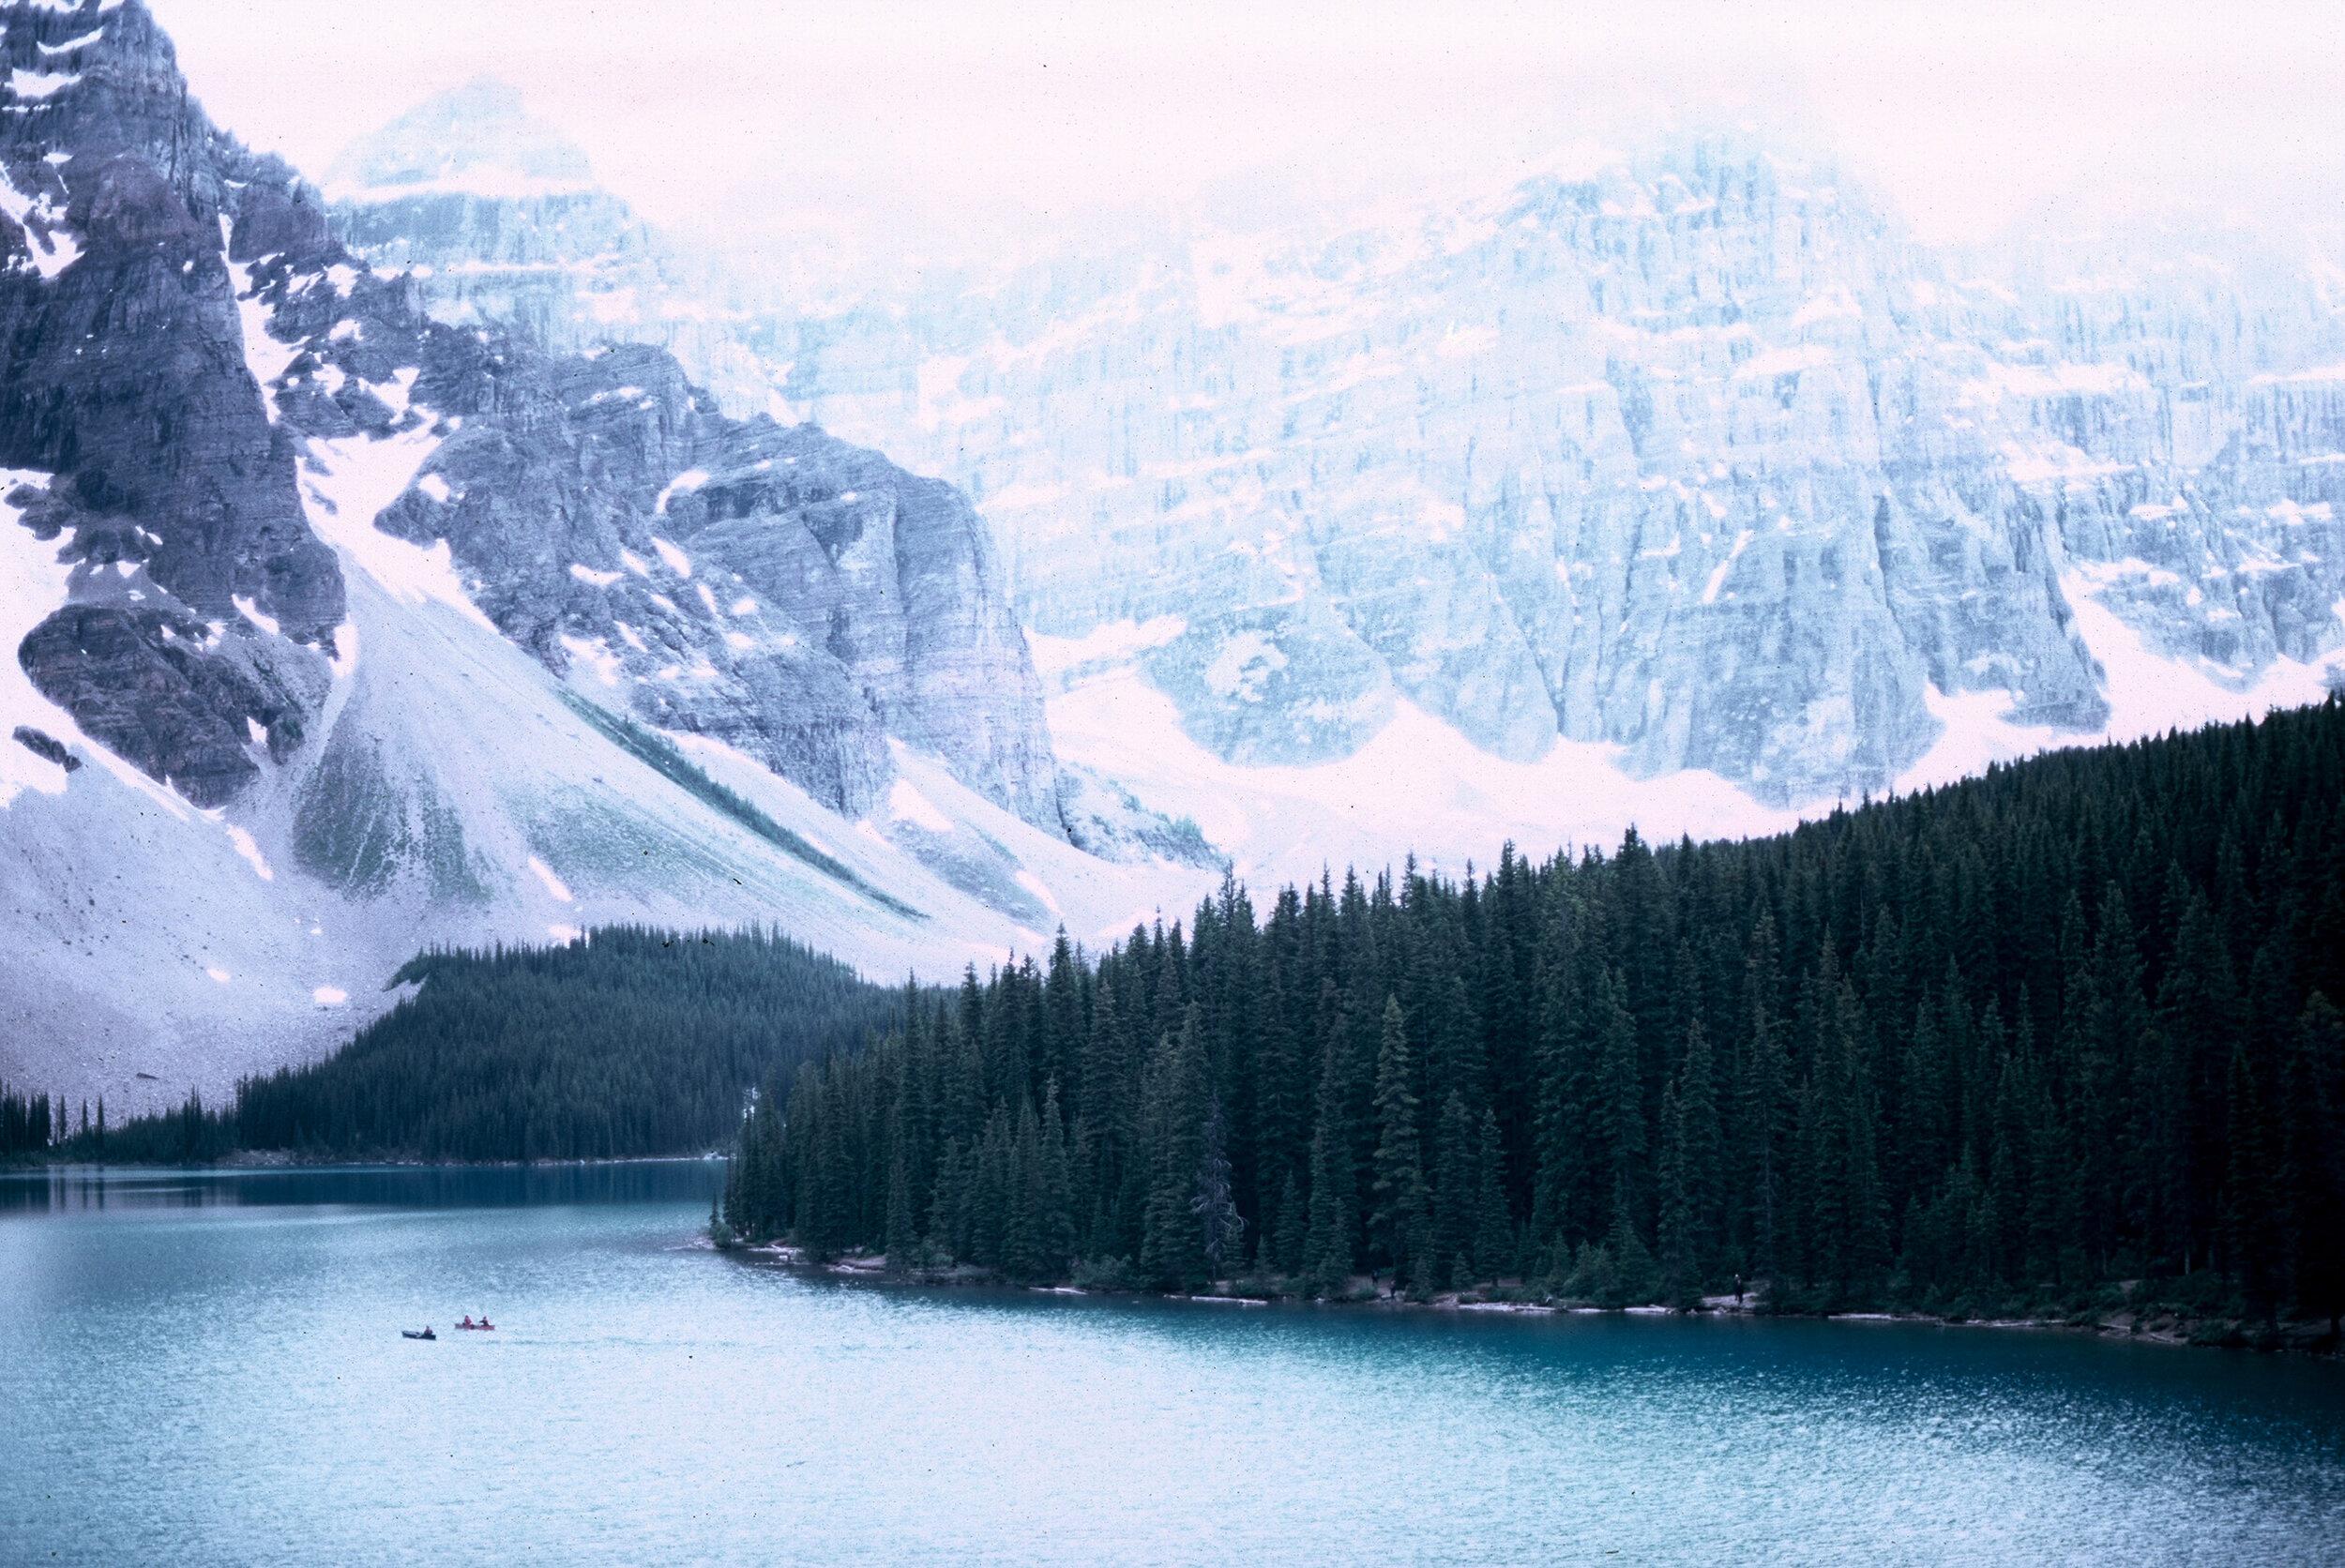 Canadian Rockies Banff Jasper Alberta Mountains 35mm SLR Canon A1 Sample Provia 100f Film Lake Moraine